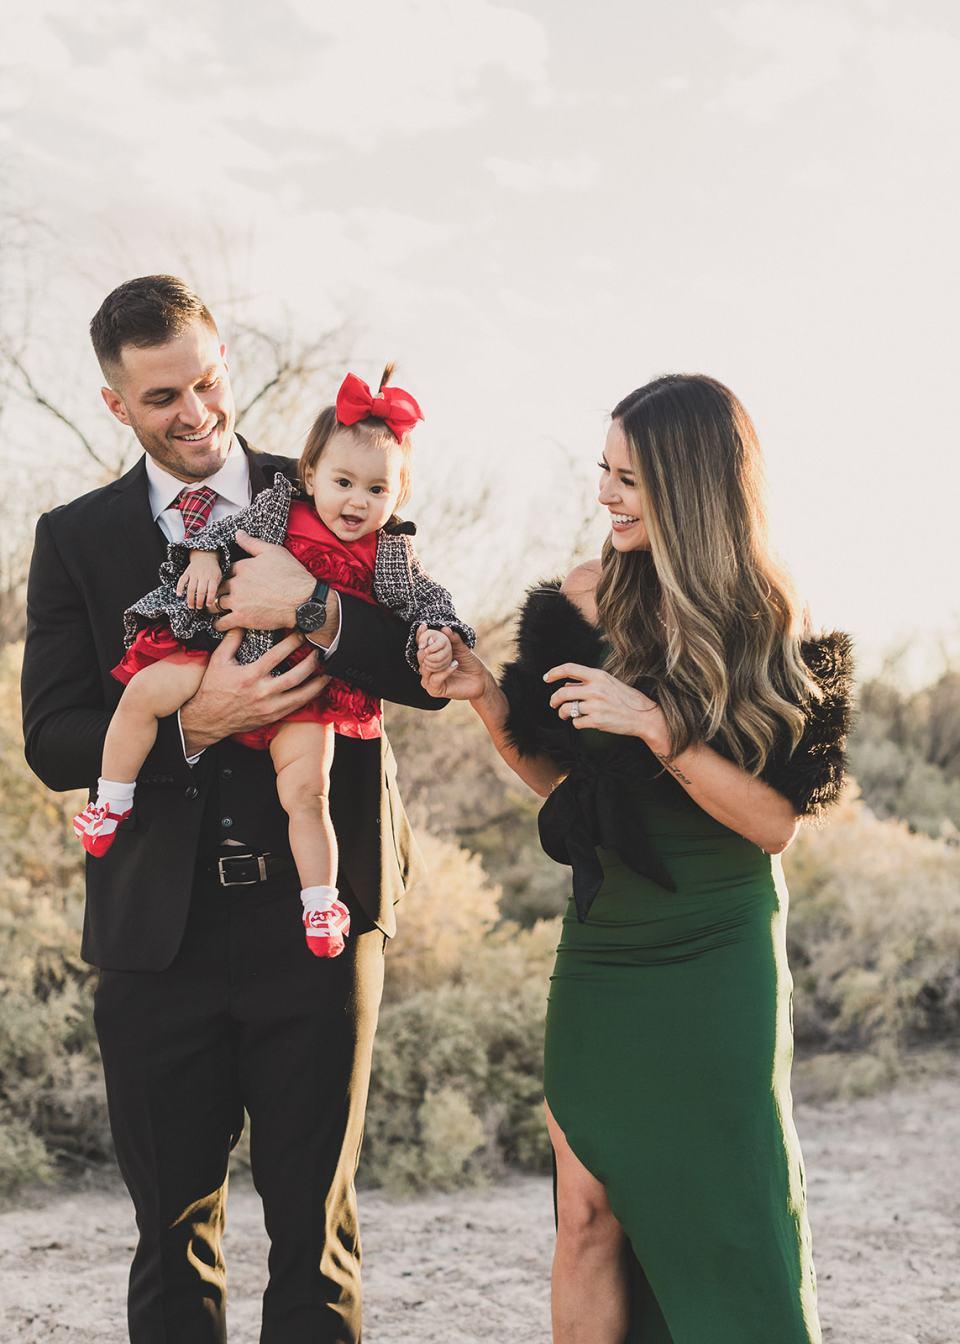 classy Las Vegas family portraits at Wetland Park